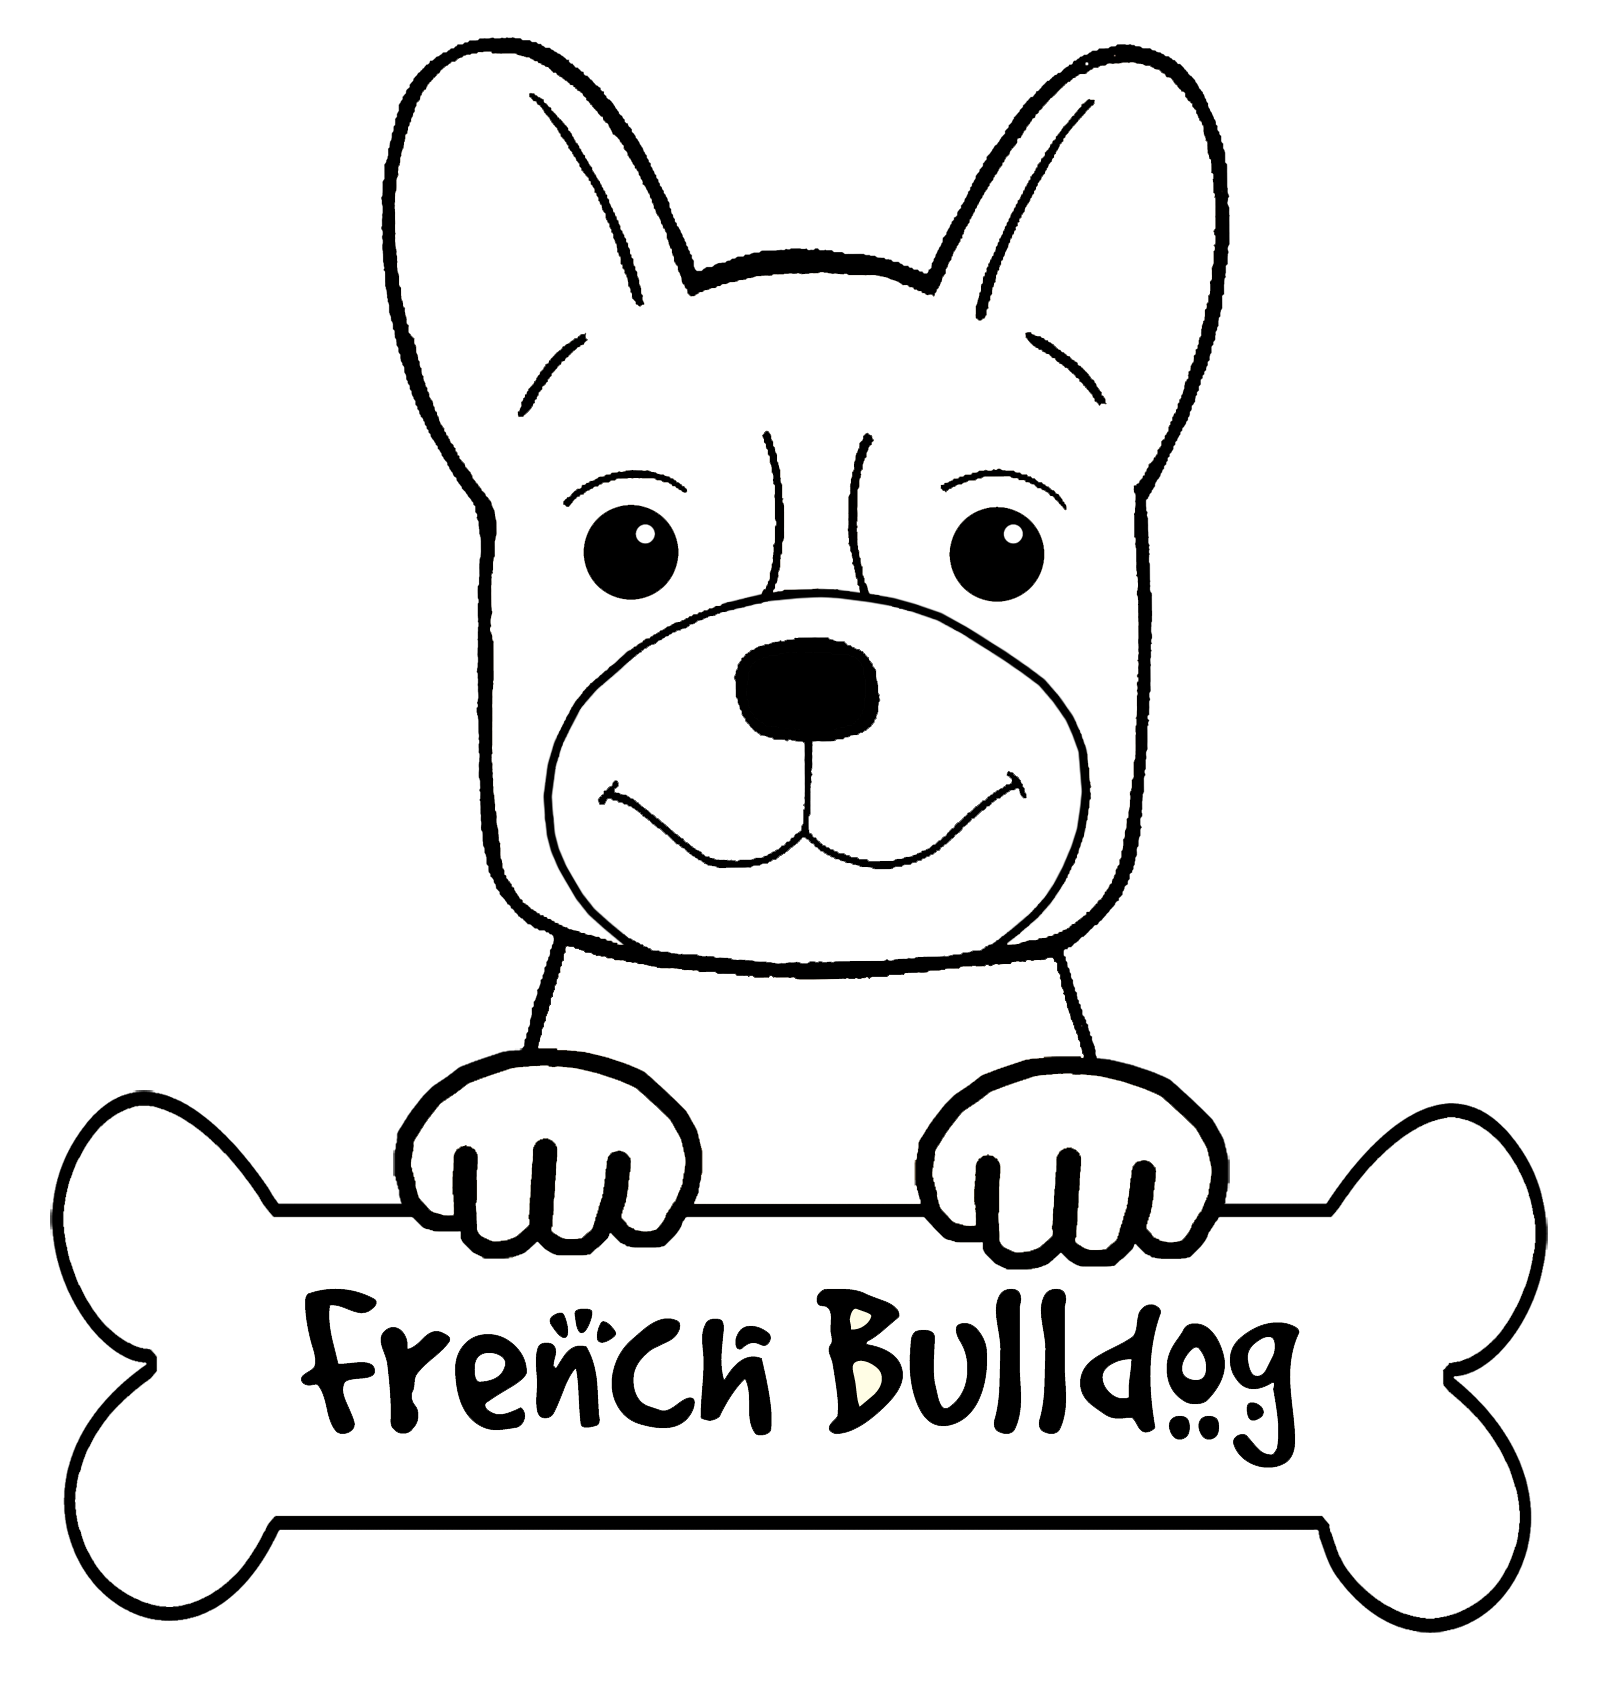 bulldog coloring book pages - photo#35